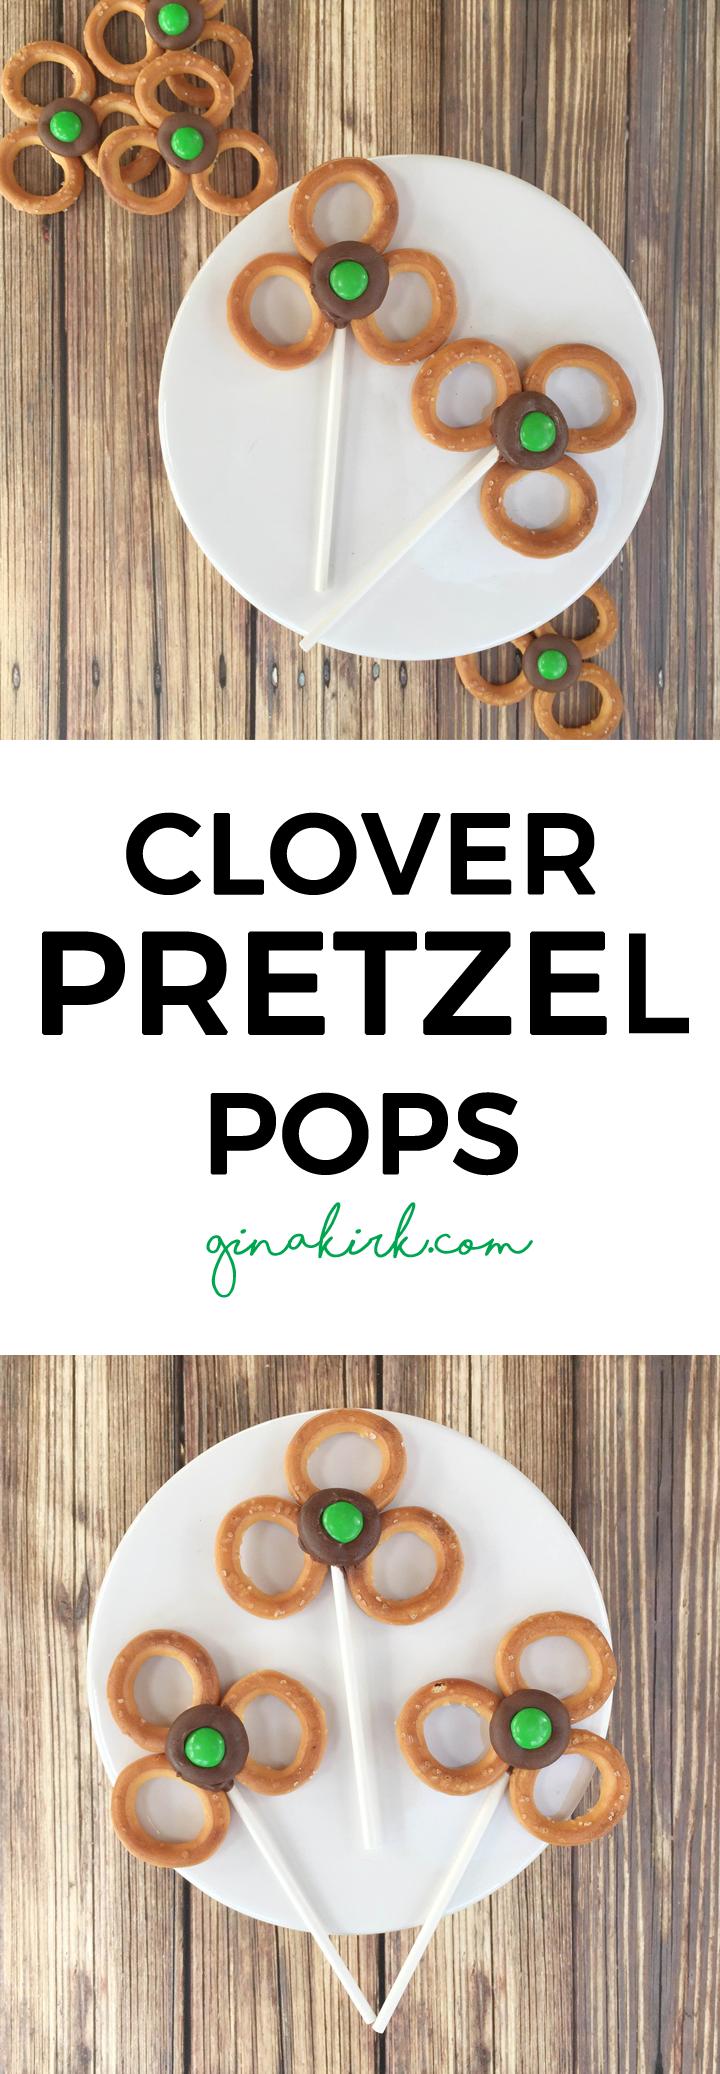 St. Patrick's Day clover pops | St. Patrick's Day snack idea | Leprechaun snacks | Kid snack ideas | GinaKirk.com @ginaekirk